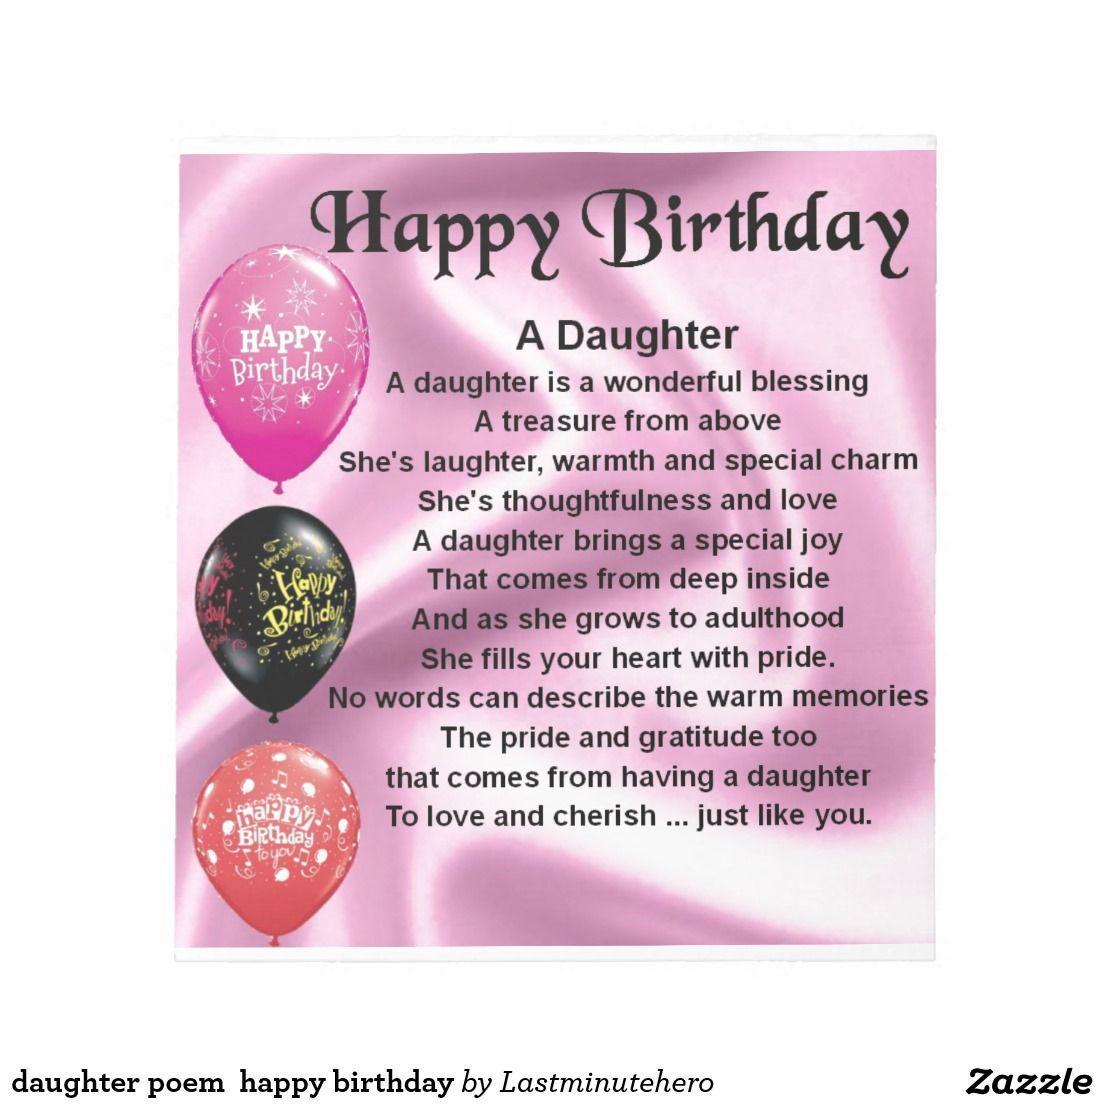 Daughter poem happy birthday notepad poem happy birthday and daughter poem happy birthday memo pad kristyandbryce Choice Image